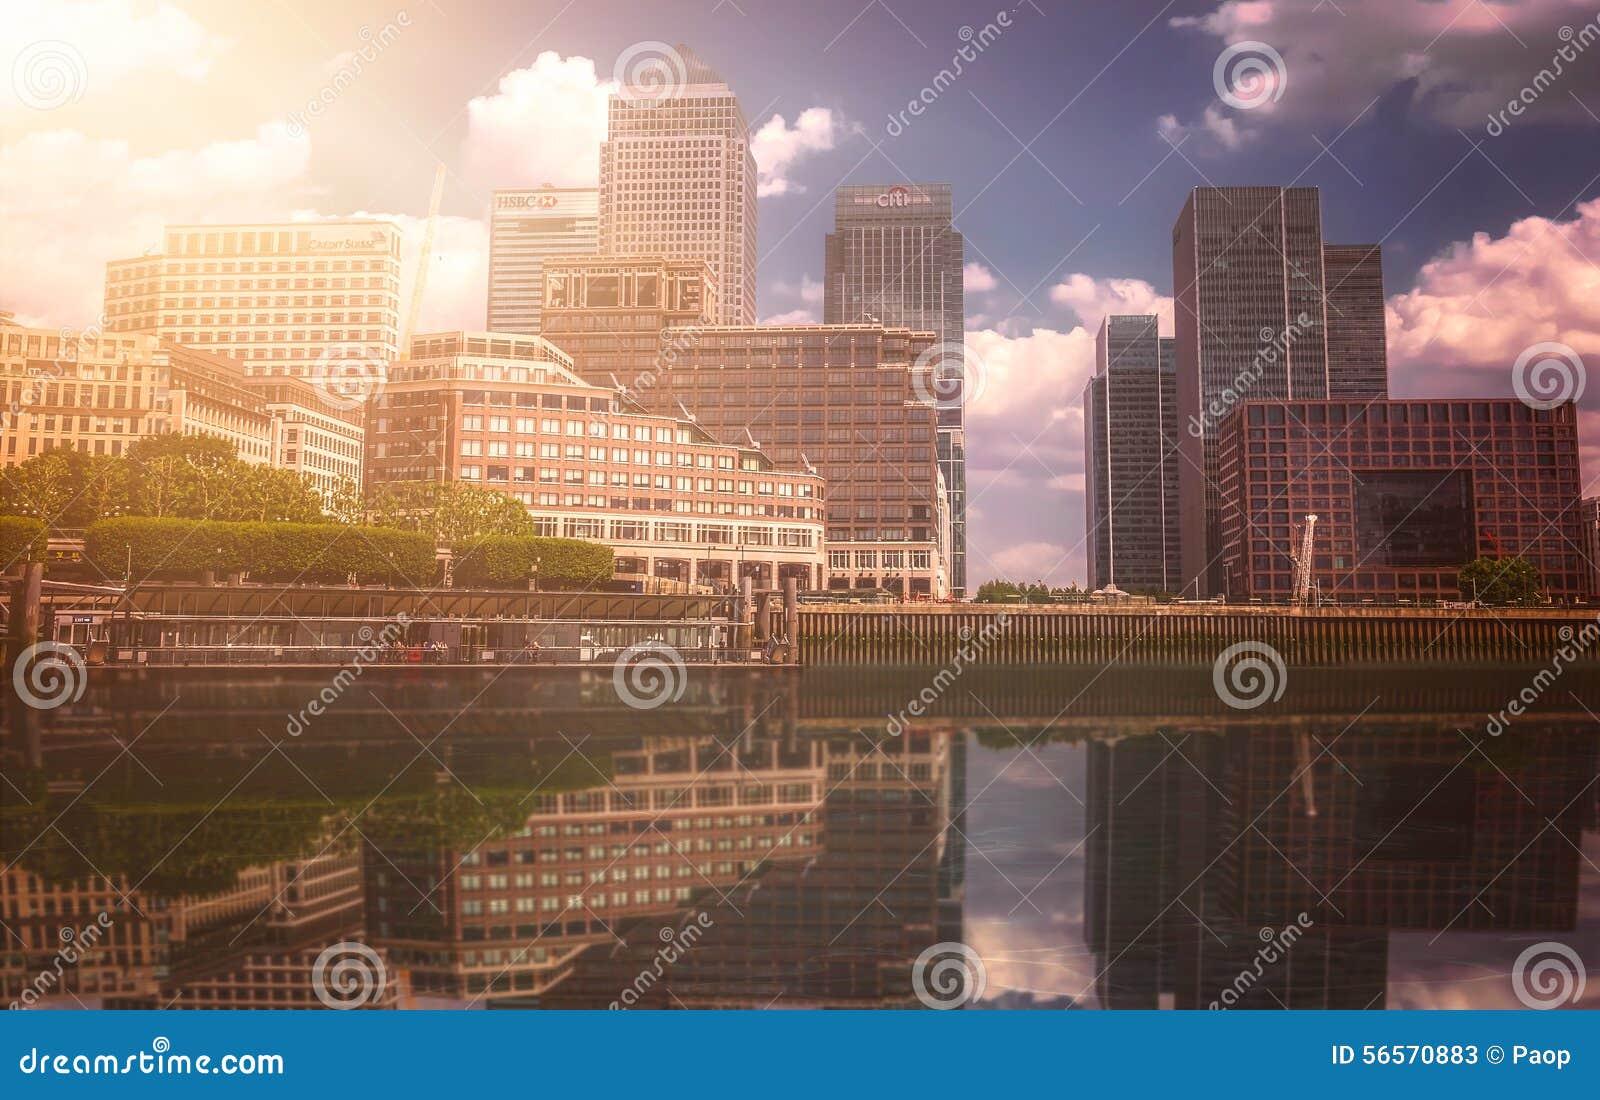 Download Ορίζοντας Canary Wharf εκδοτική στοκ εικόνες. εικόνα από γυαλί - 56570883